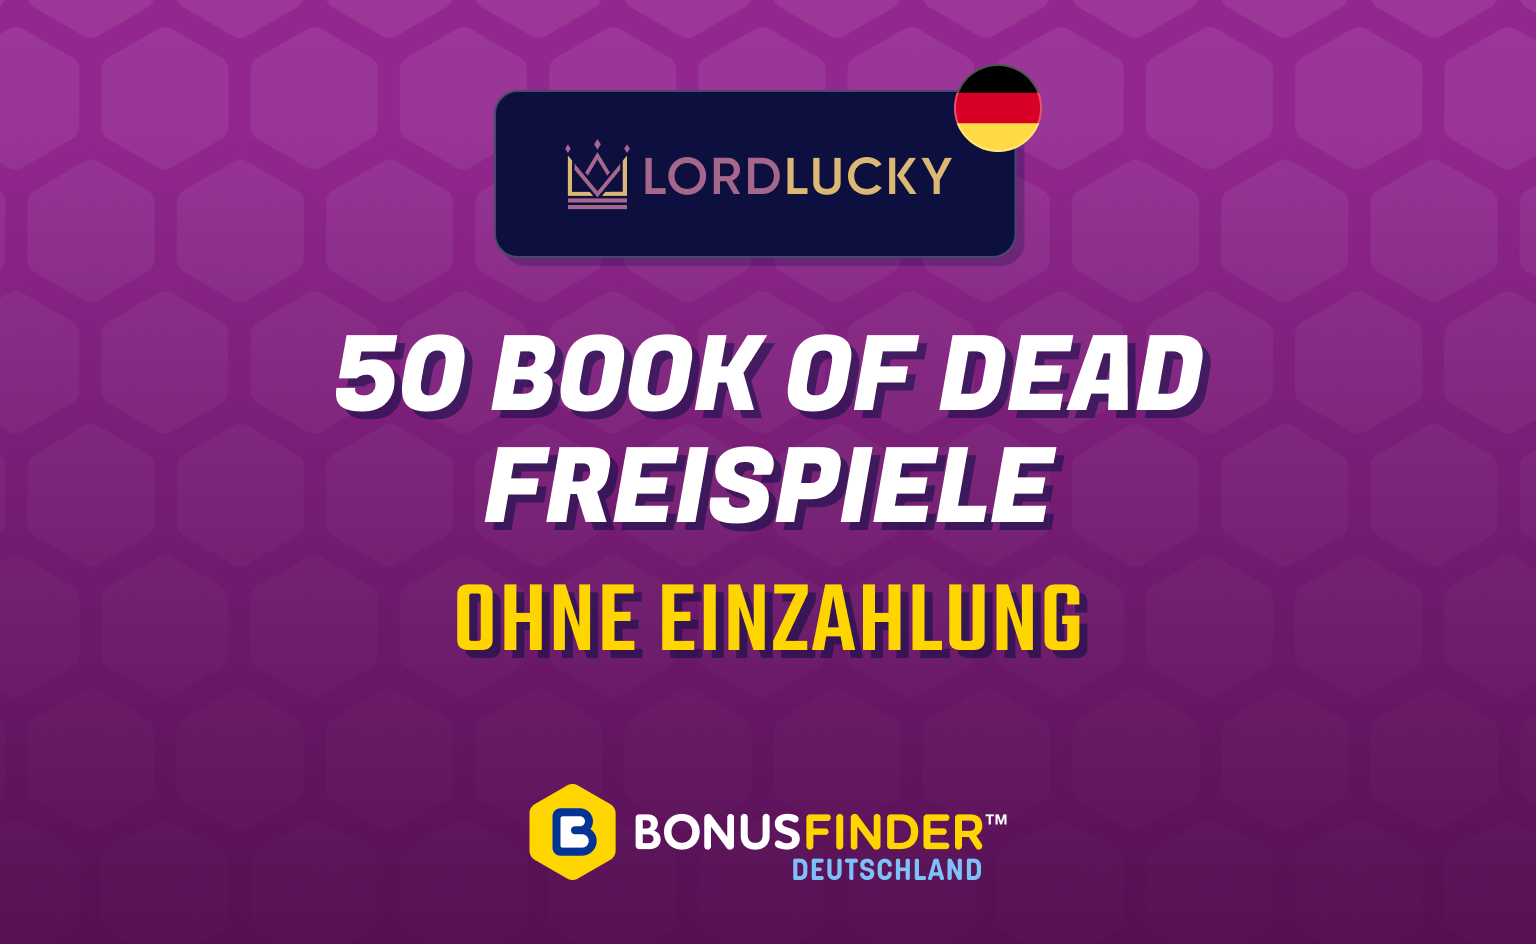 50 book of dead freispiele lord lucky